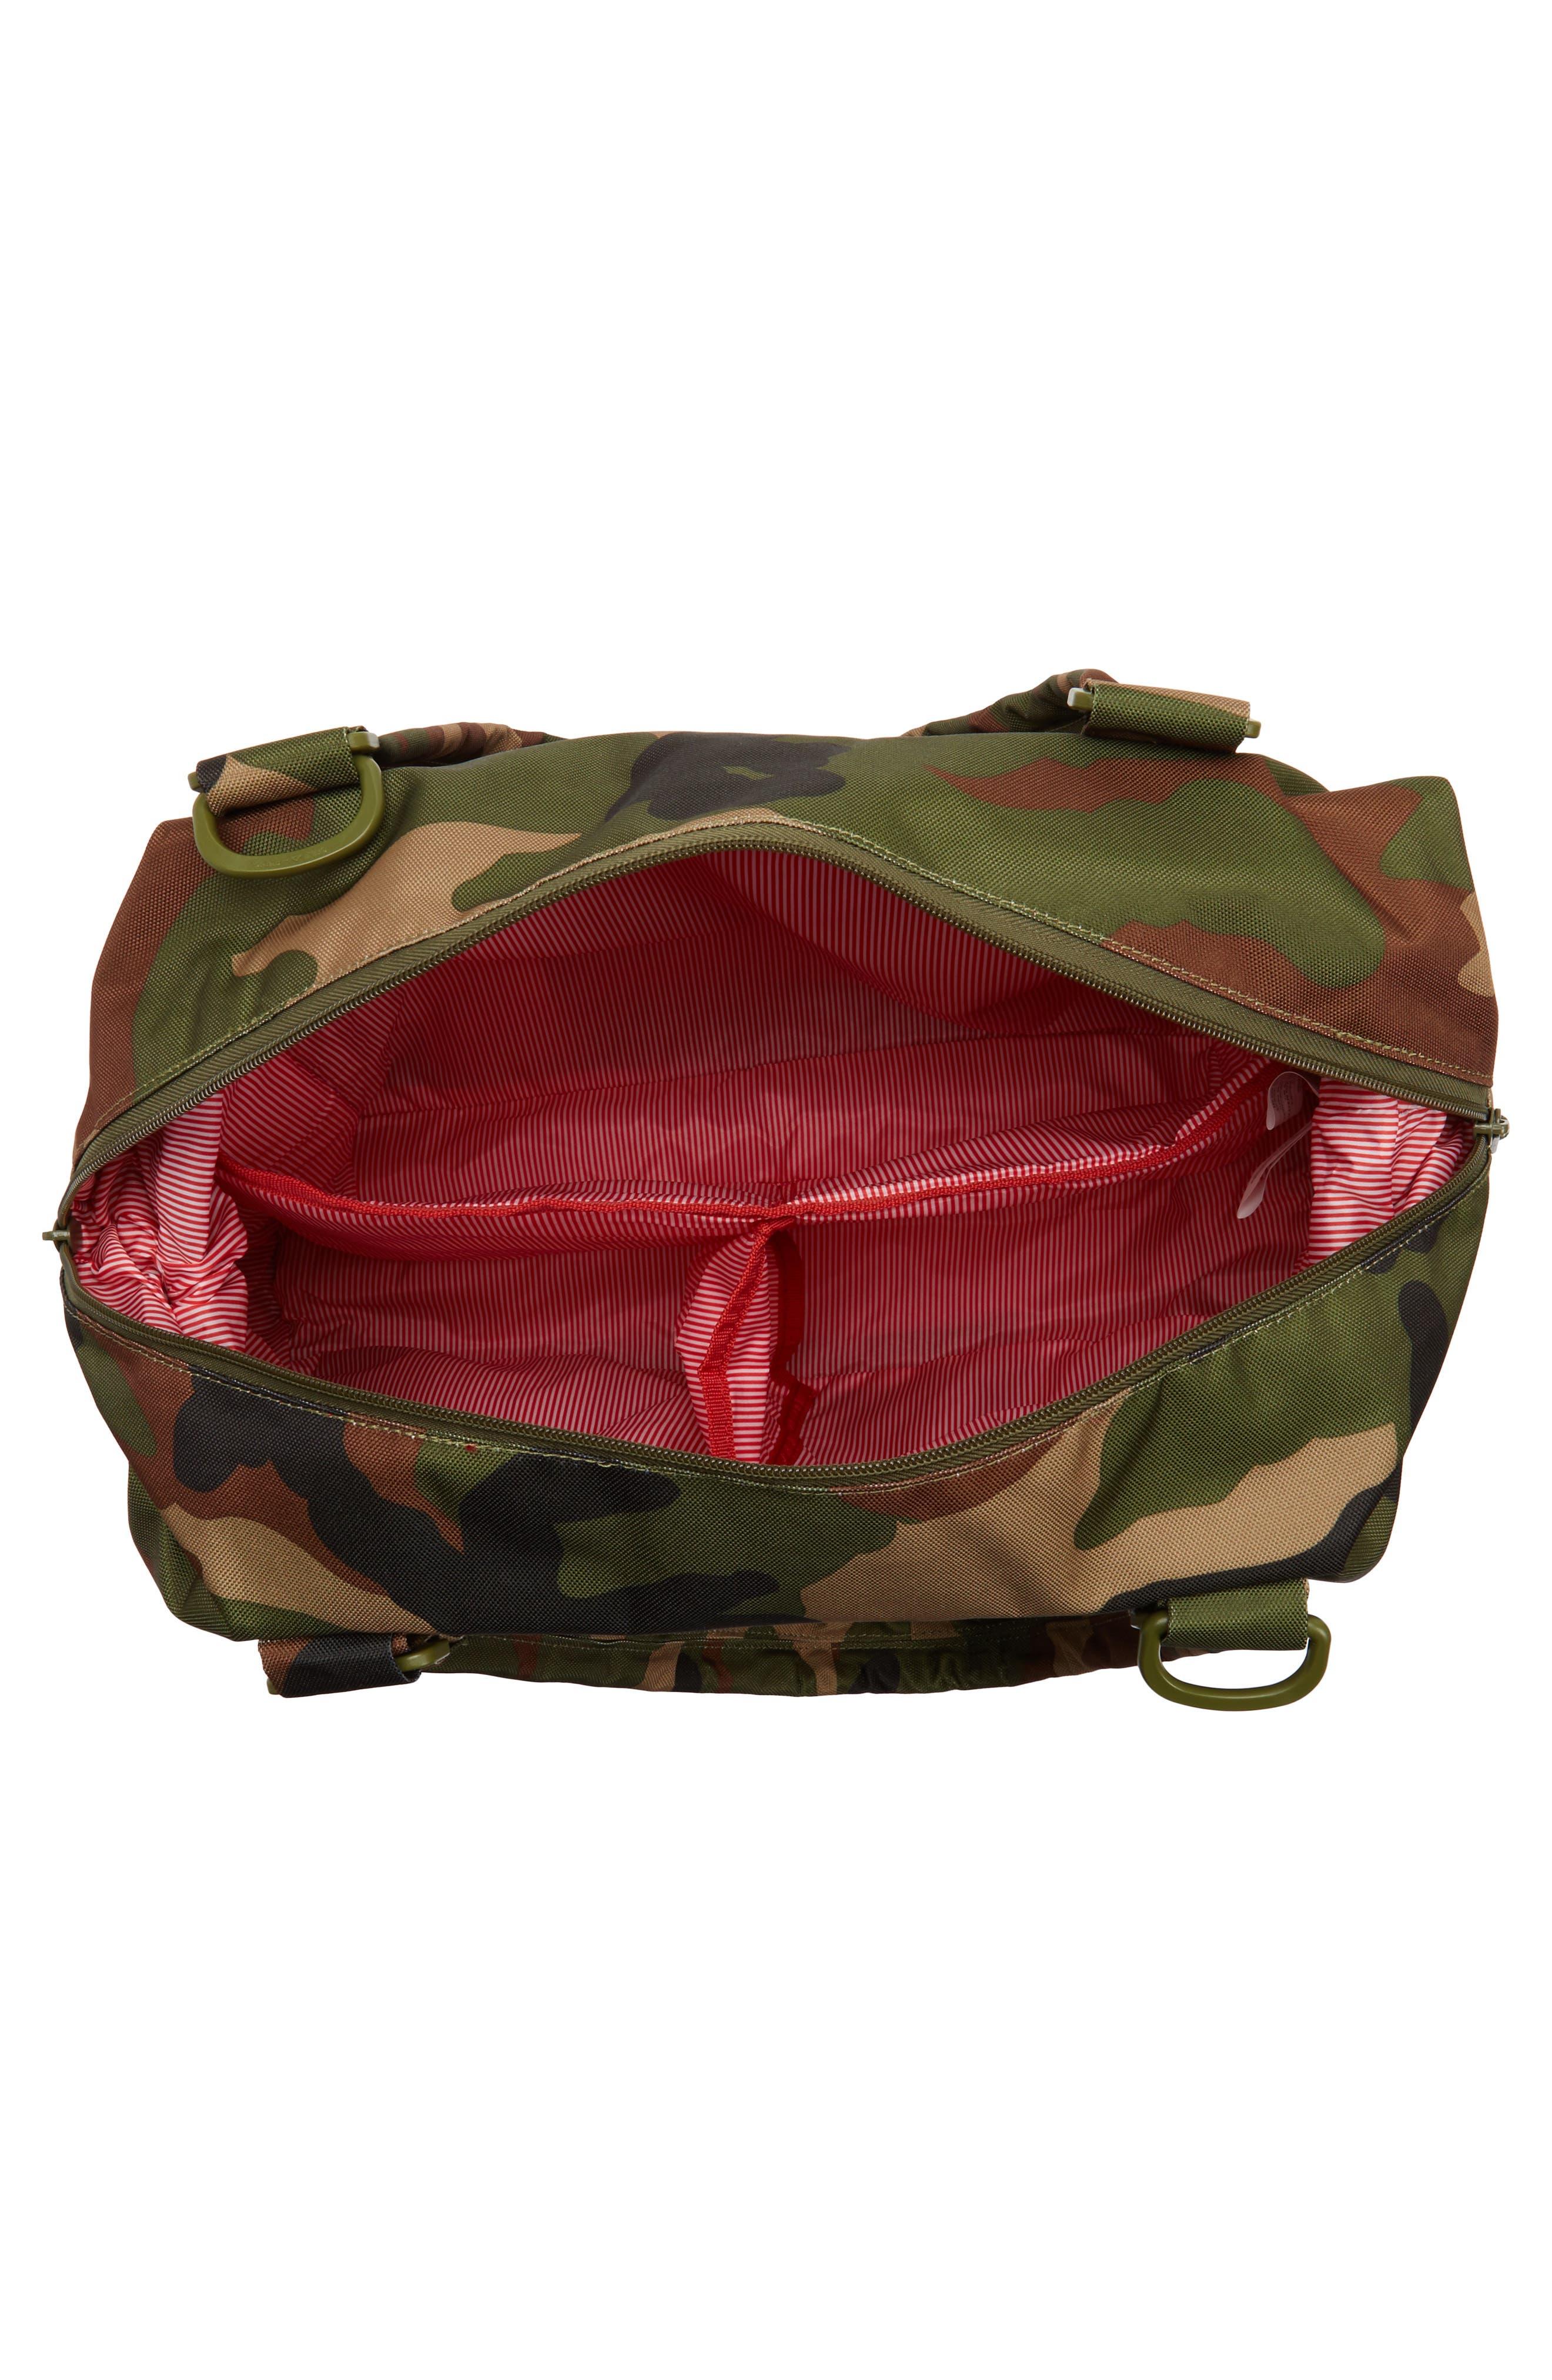 Sprout Diaper Bag,                             Alternate thumbnail 4, color,                             WOODLAND CAMO